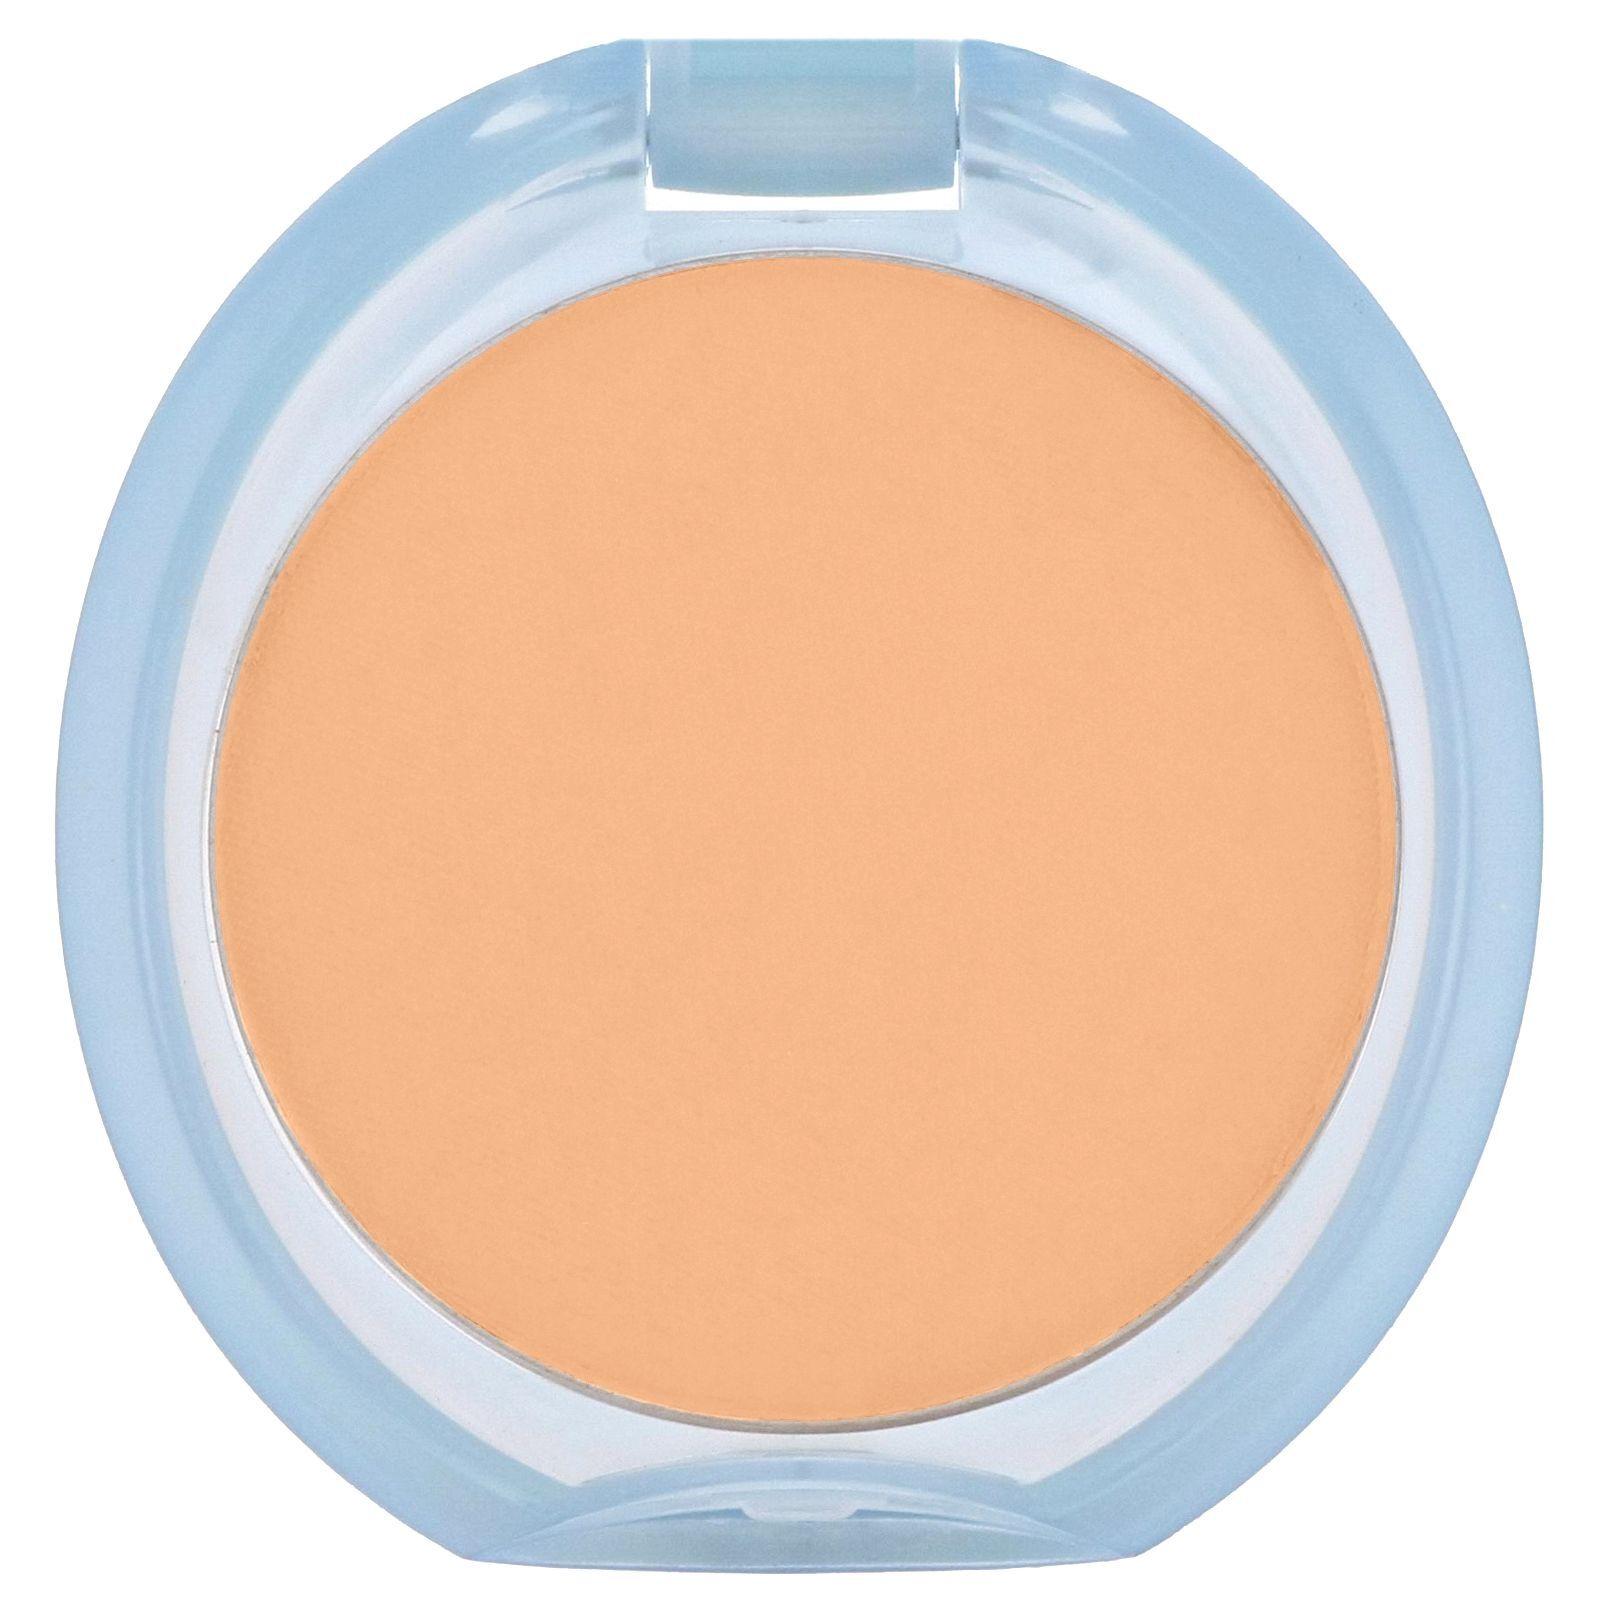 Shiseido Pureness Matifying Compact Oil-Free Foundation SPF15 20 Beige chiaro 11g / 0.38 oz.